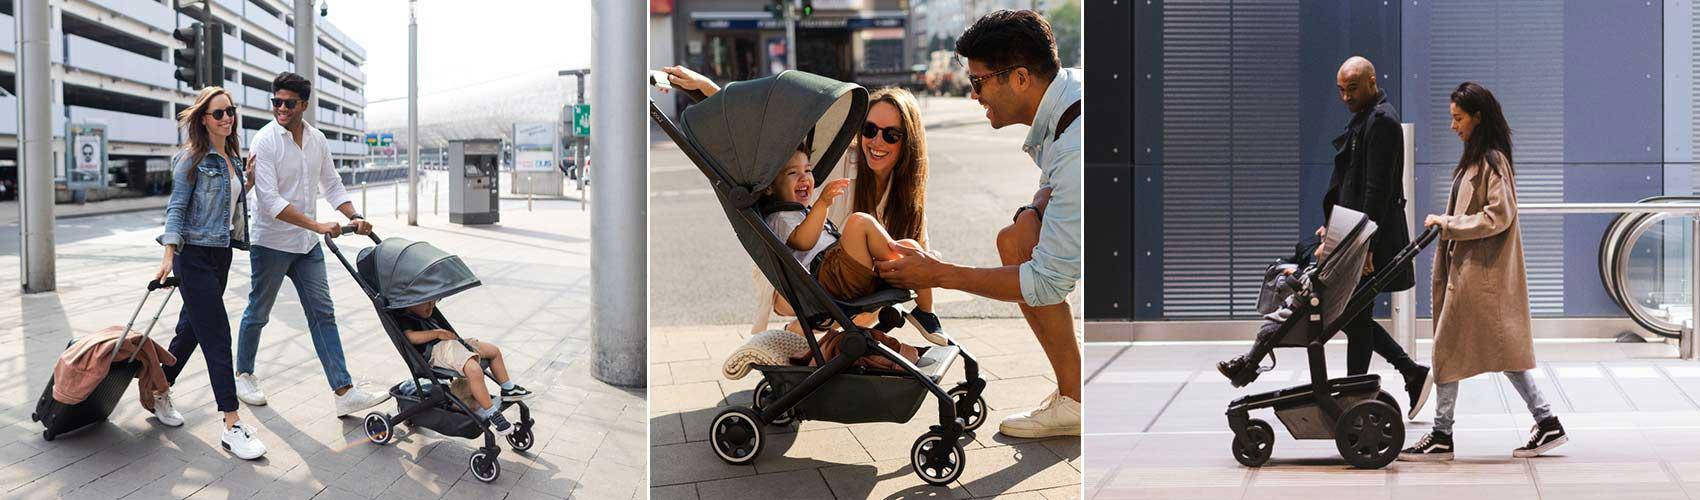 Passeggini Joolz vendita online - Bimbi Megastore negozio per la prima infanzia